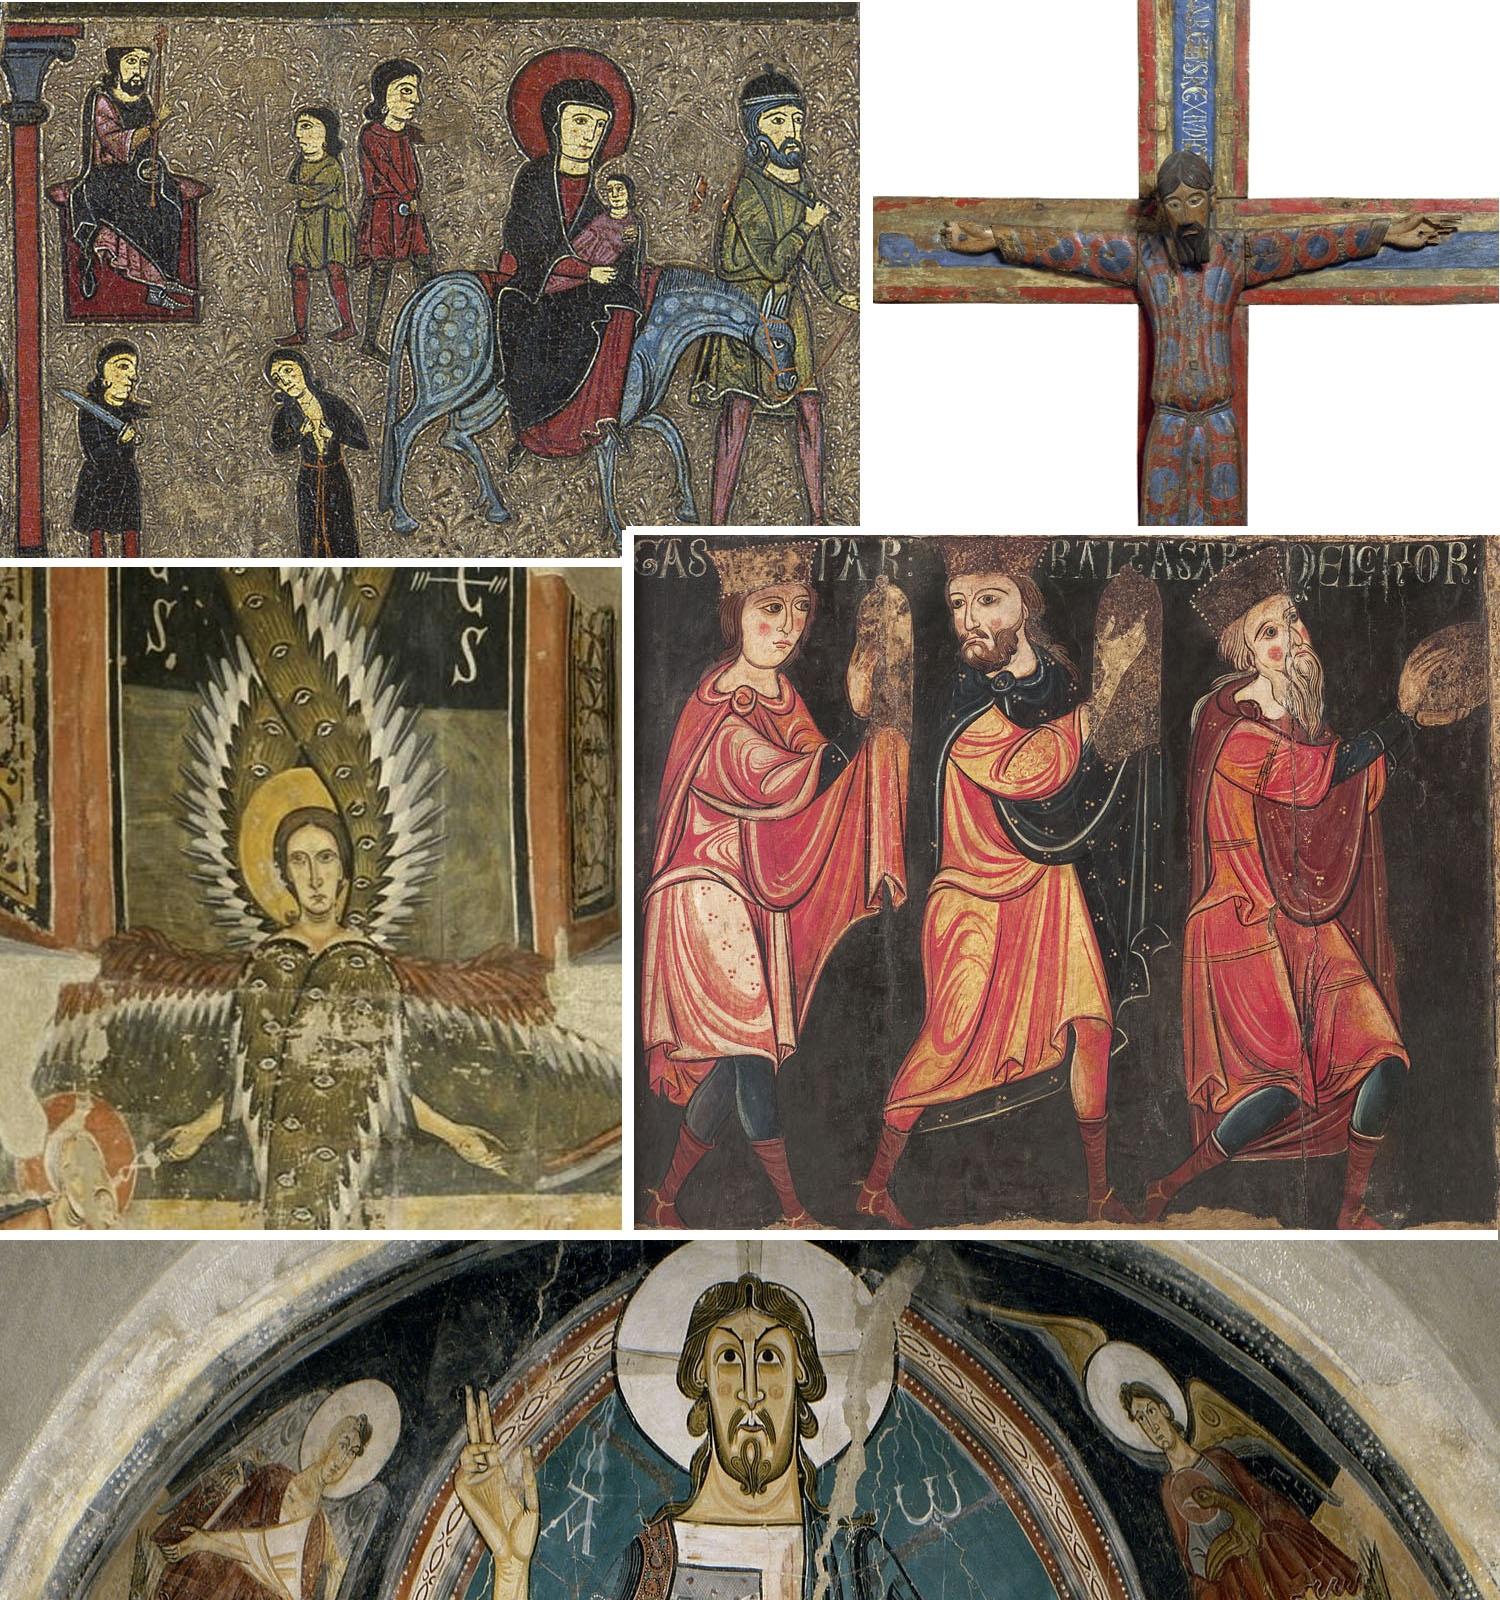 The voices of the Romanesque - virtual tour